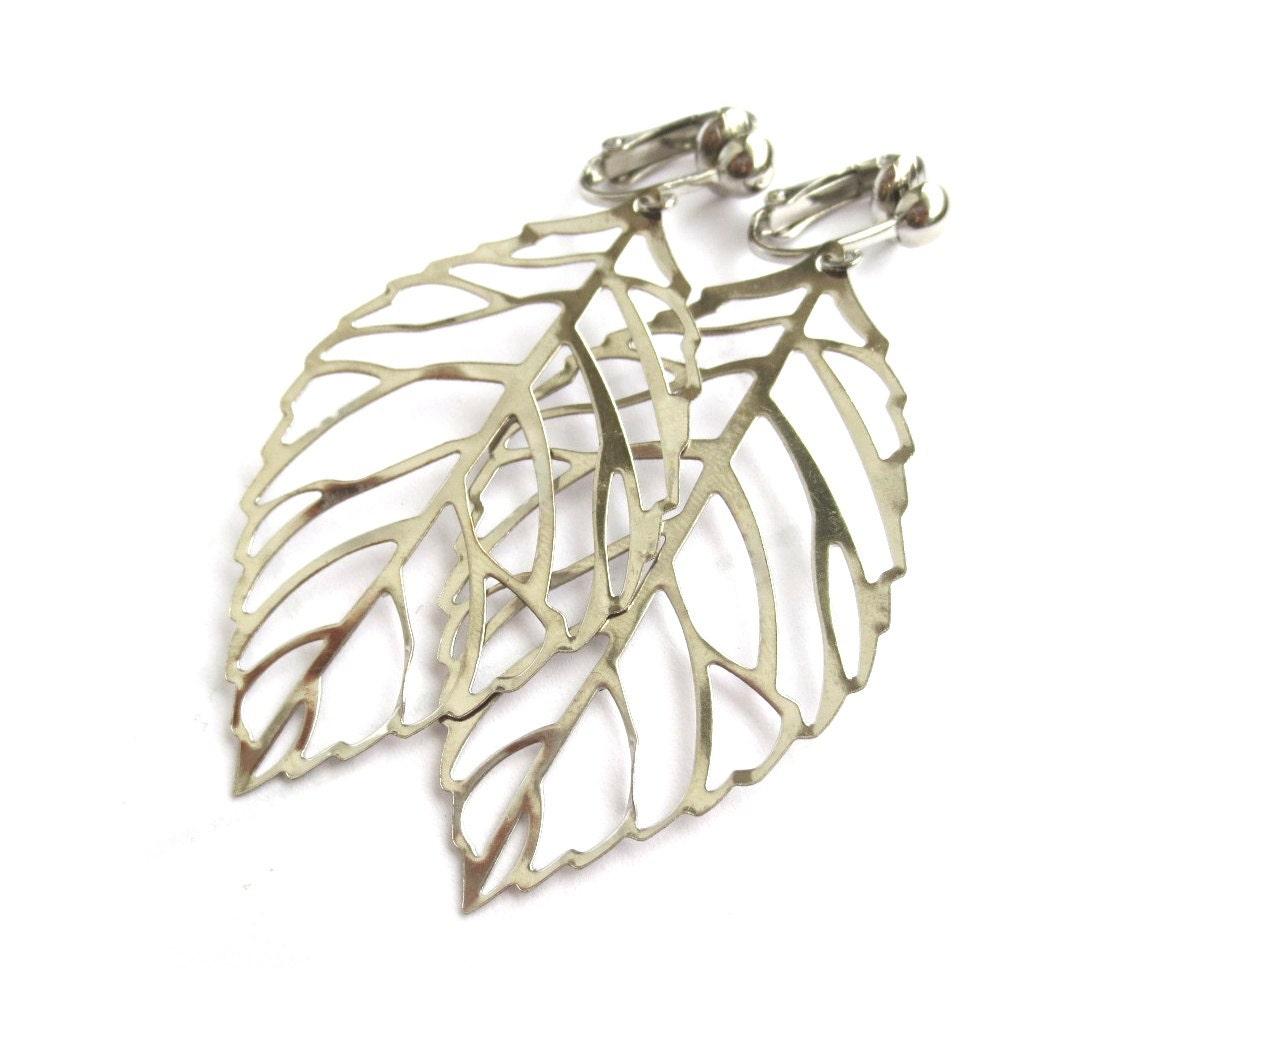 L E A V E S - Silver Leaf CLIP Earrings